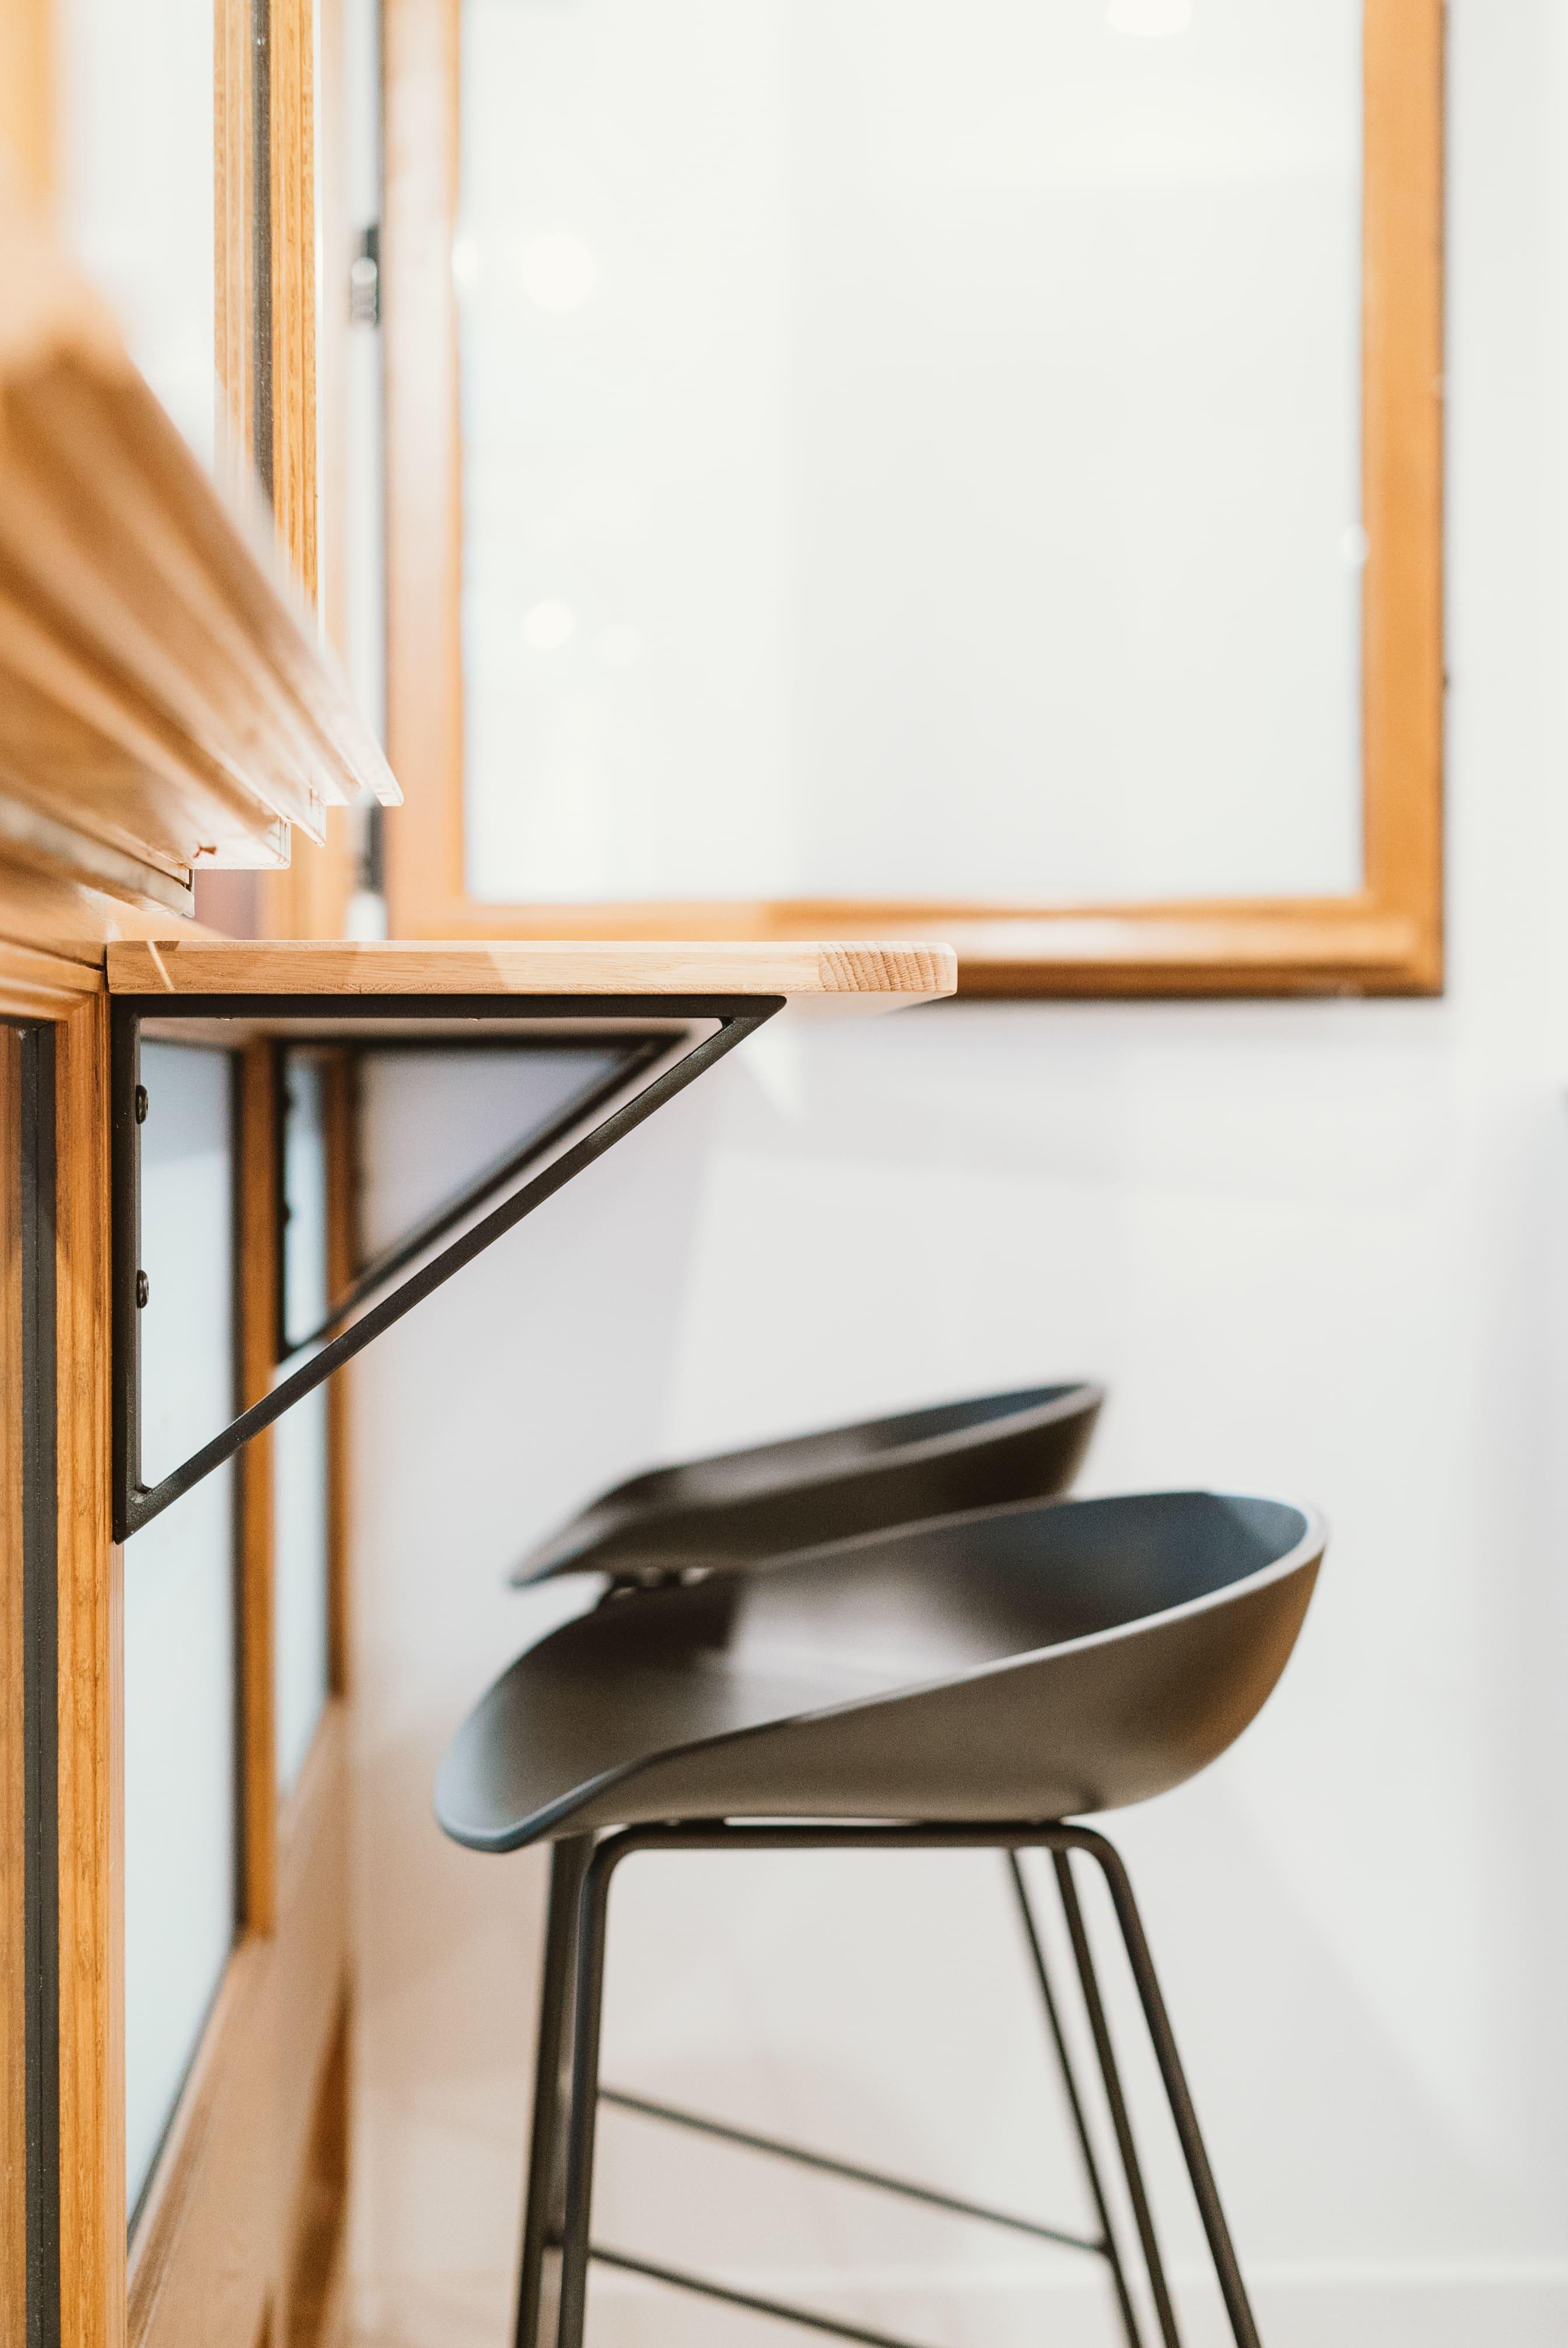 Agencement interieur design métallique ROBI restaurant Haven Annecy 74 agencement en metal 11